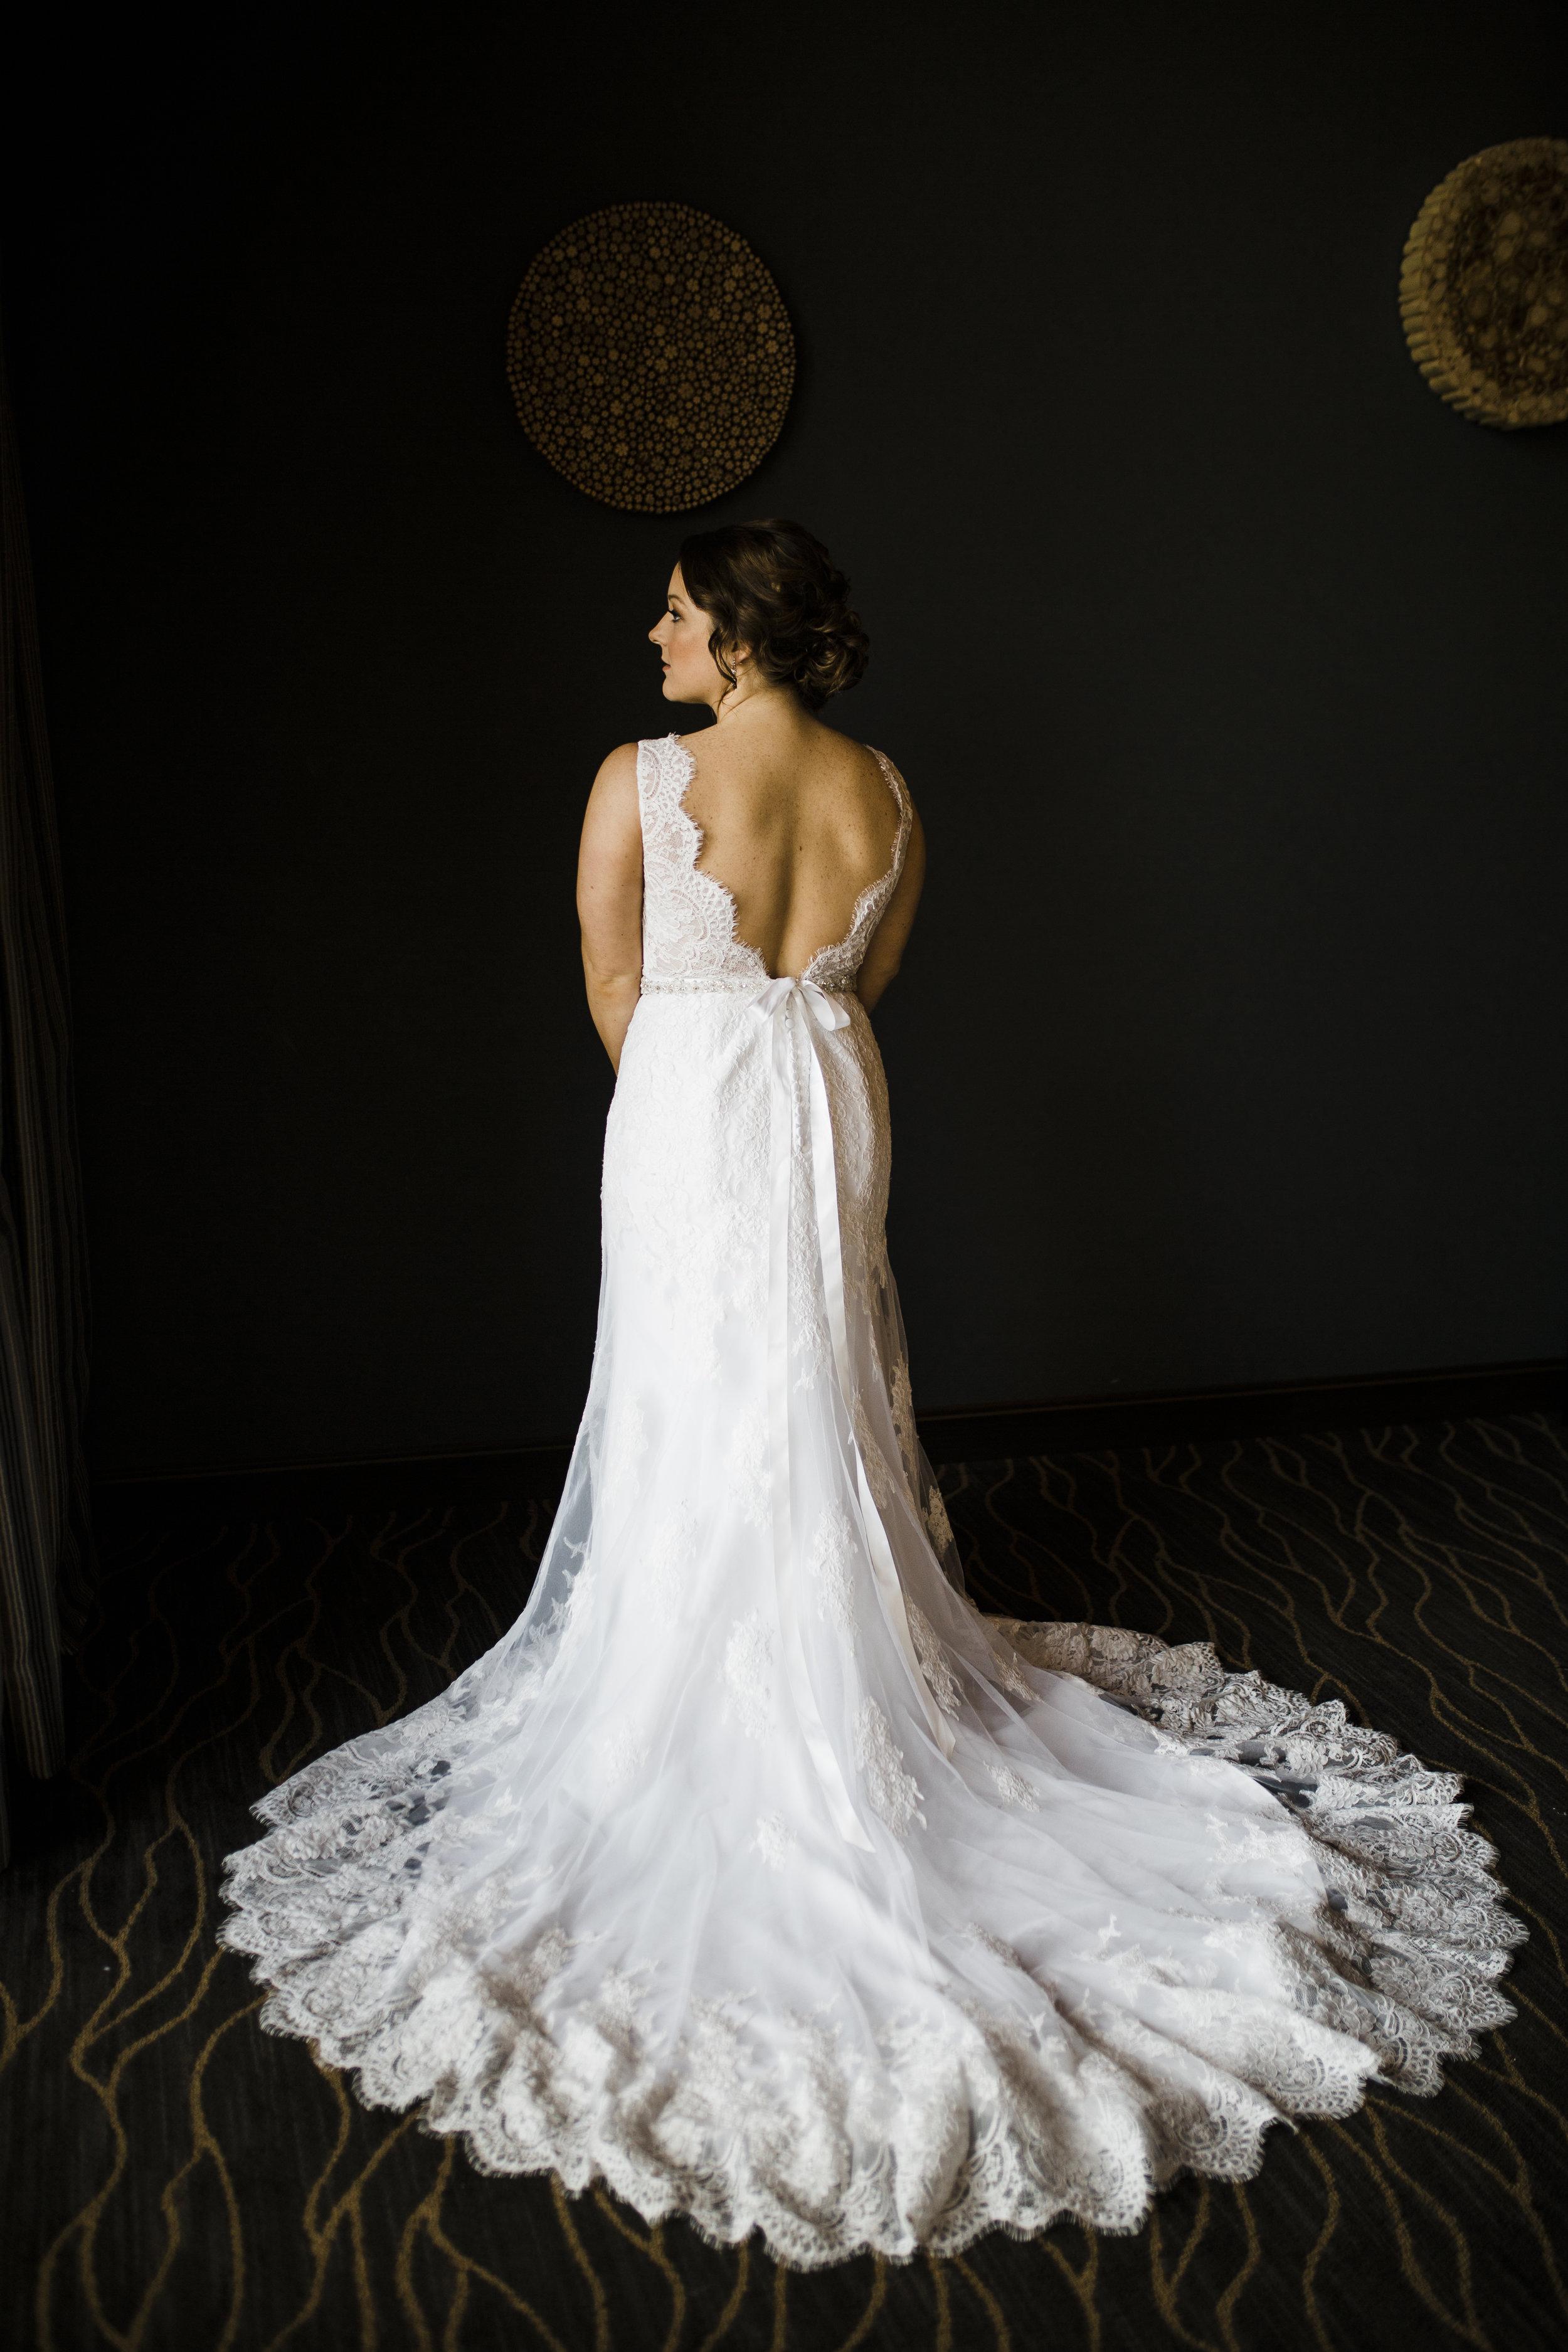 Bend-OR-Wedding-Photographer-9.jpg